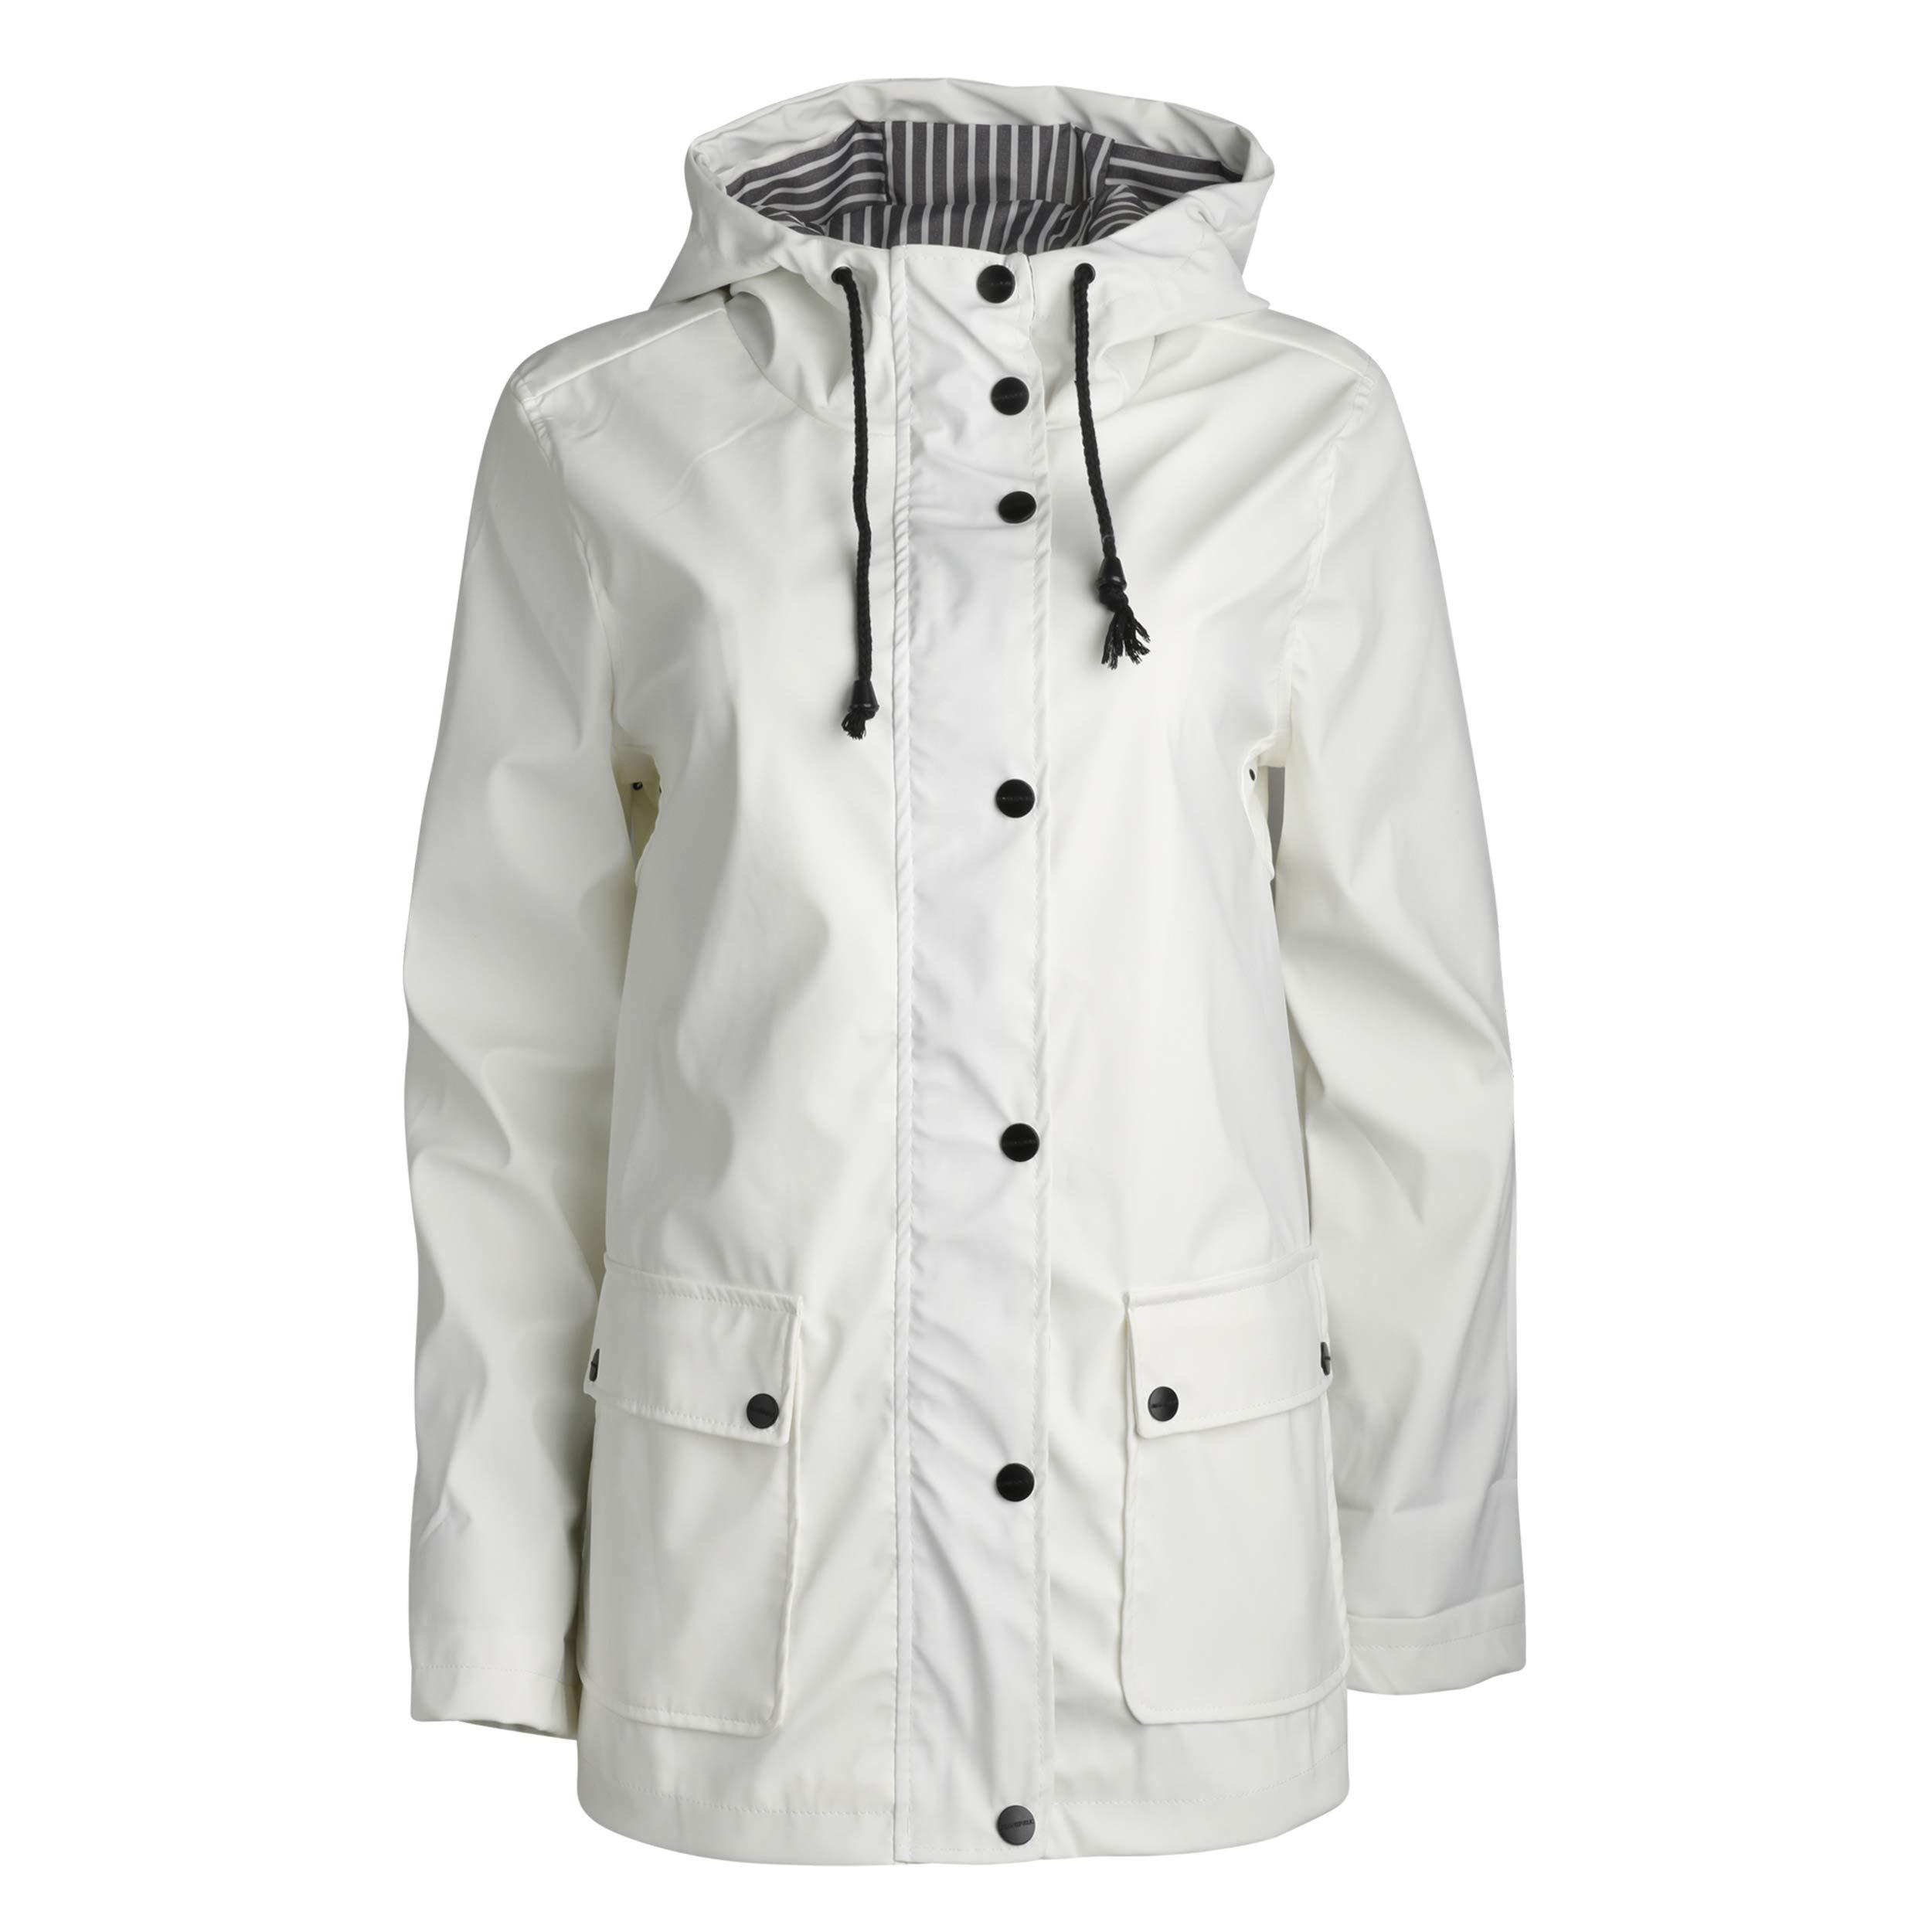 Urban Republic Women's Lightweight Vinyl Hooded Raincoat Jacket, White, Medium'' by Urban Republic